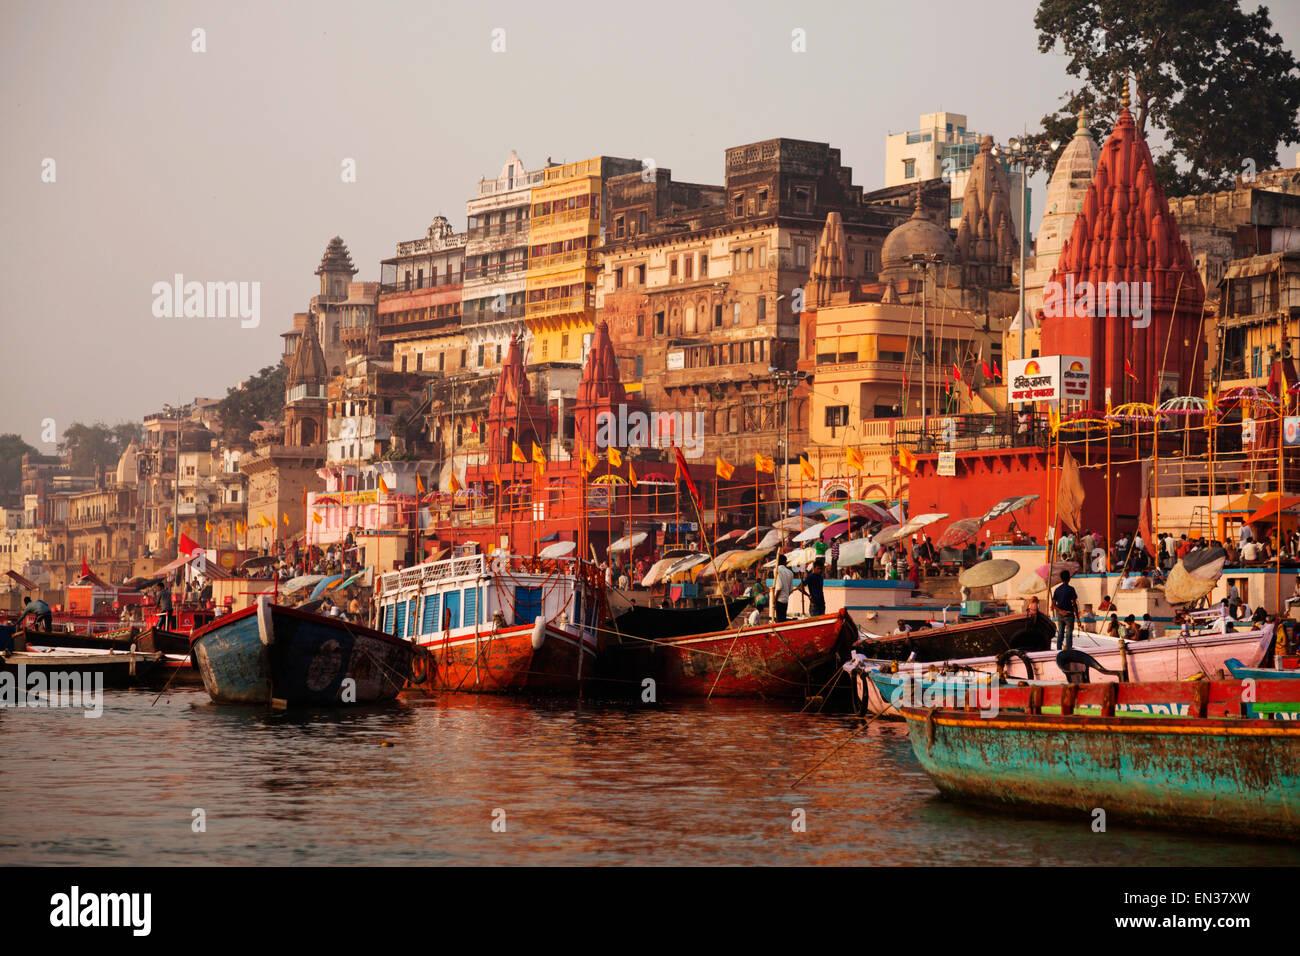 Ghats, barcos y el río Ganges, Varanasi, Uttar Pradesh, India Imagen De Stock